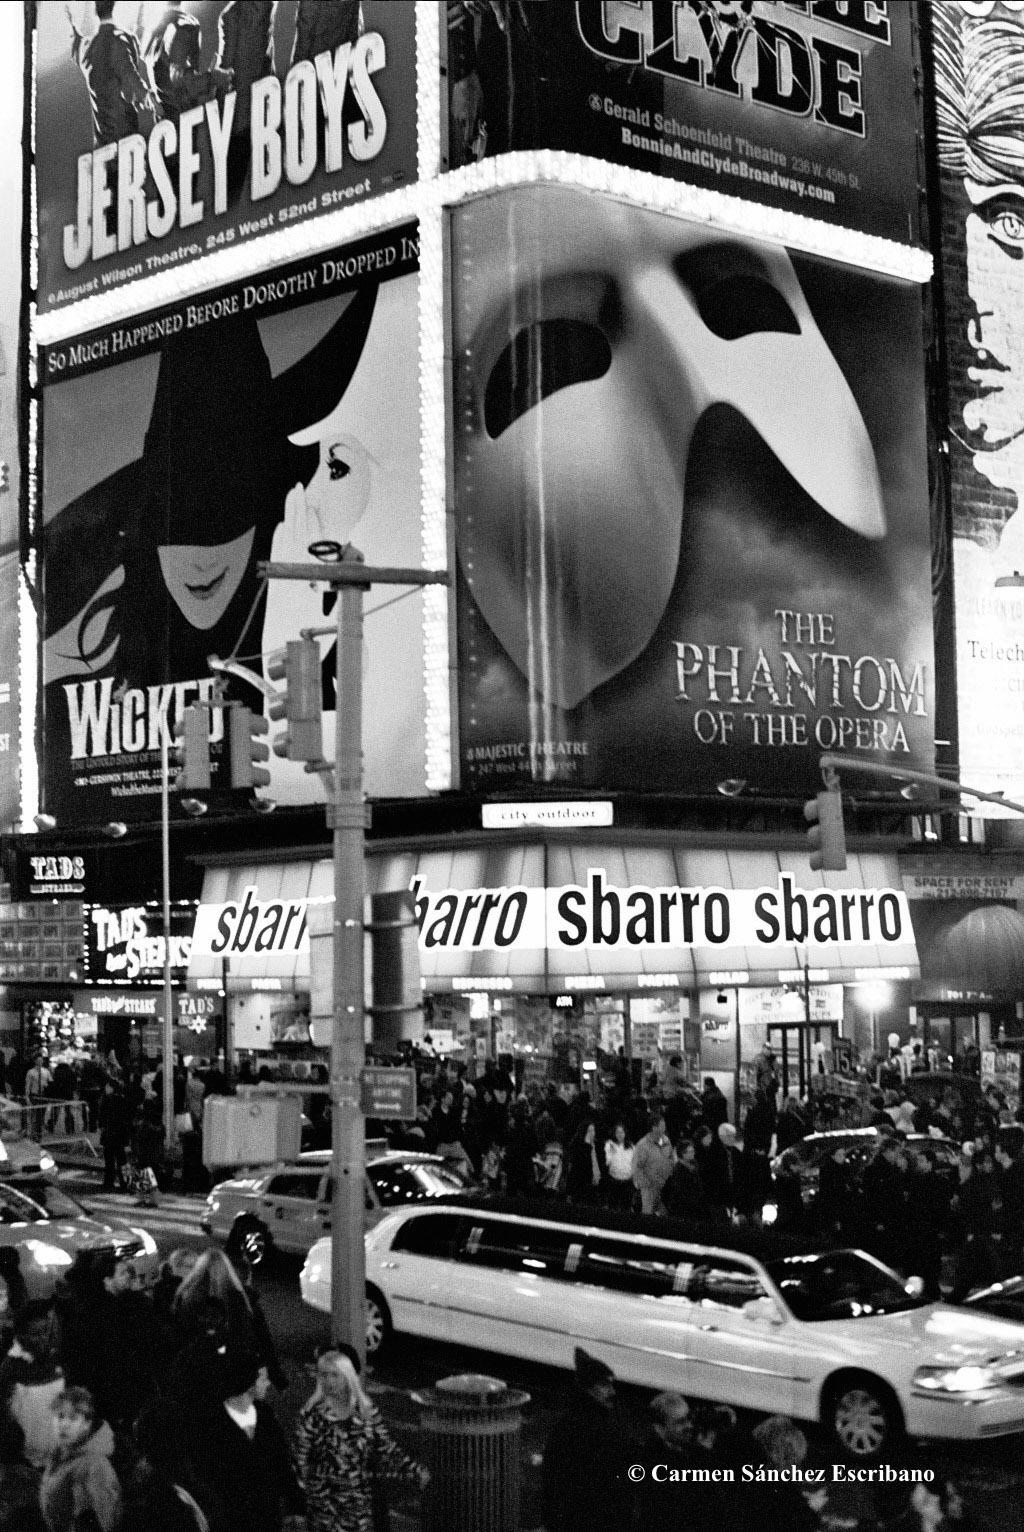 Times Square Nueva York 2011